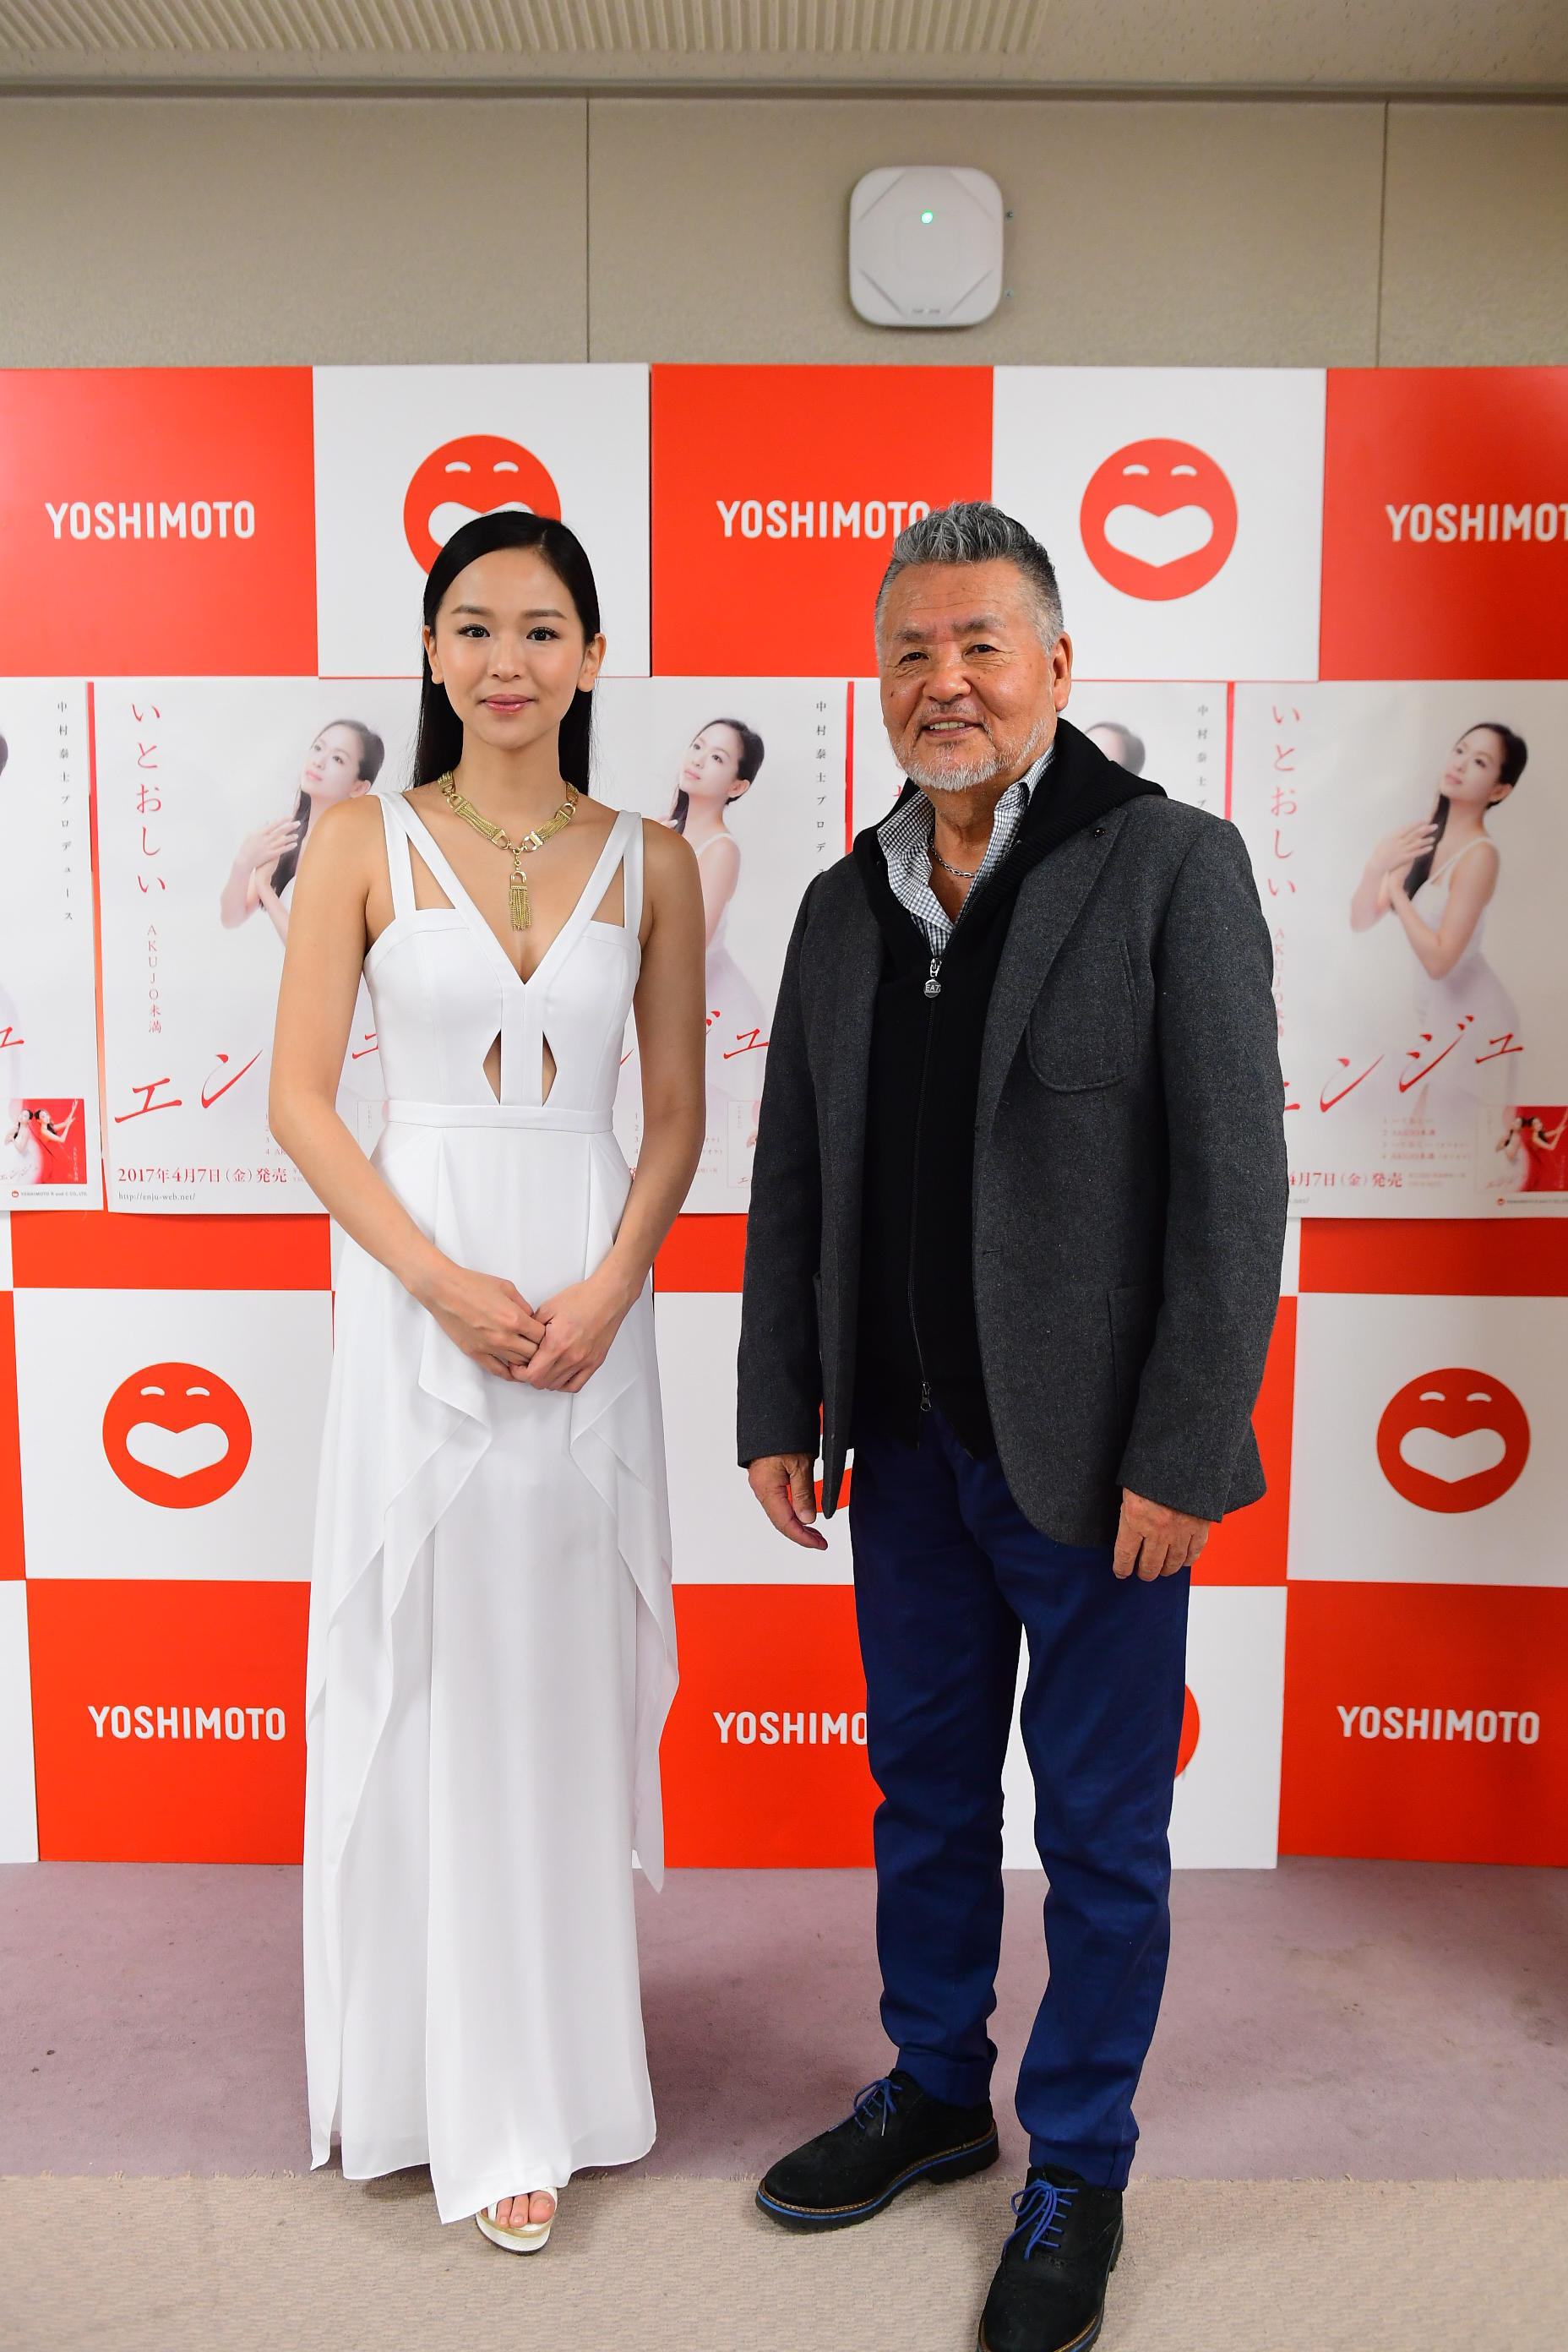 http://news.yoshimoto.co.jp/20170410142943-07fa071dca48f410e7a2f2767a074eacf75fd29e.jpg